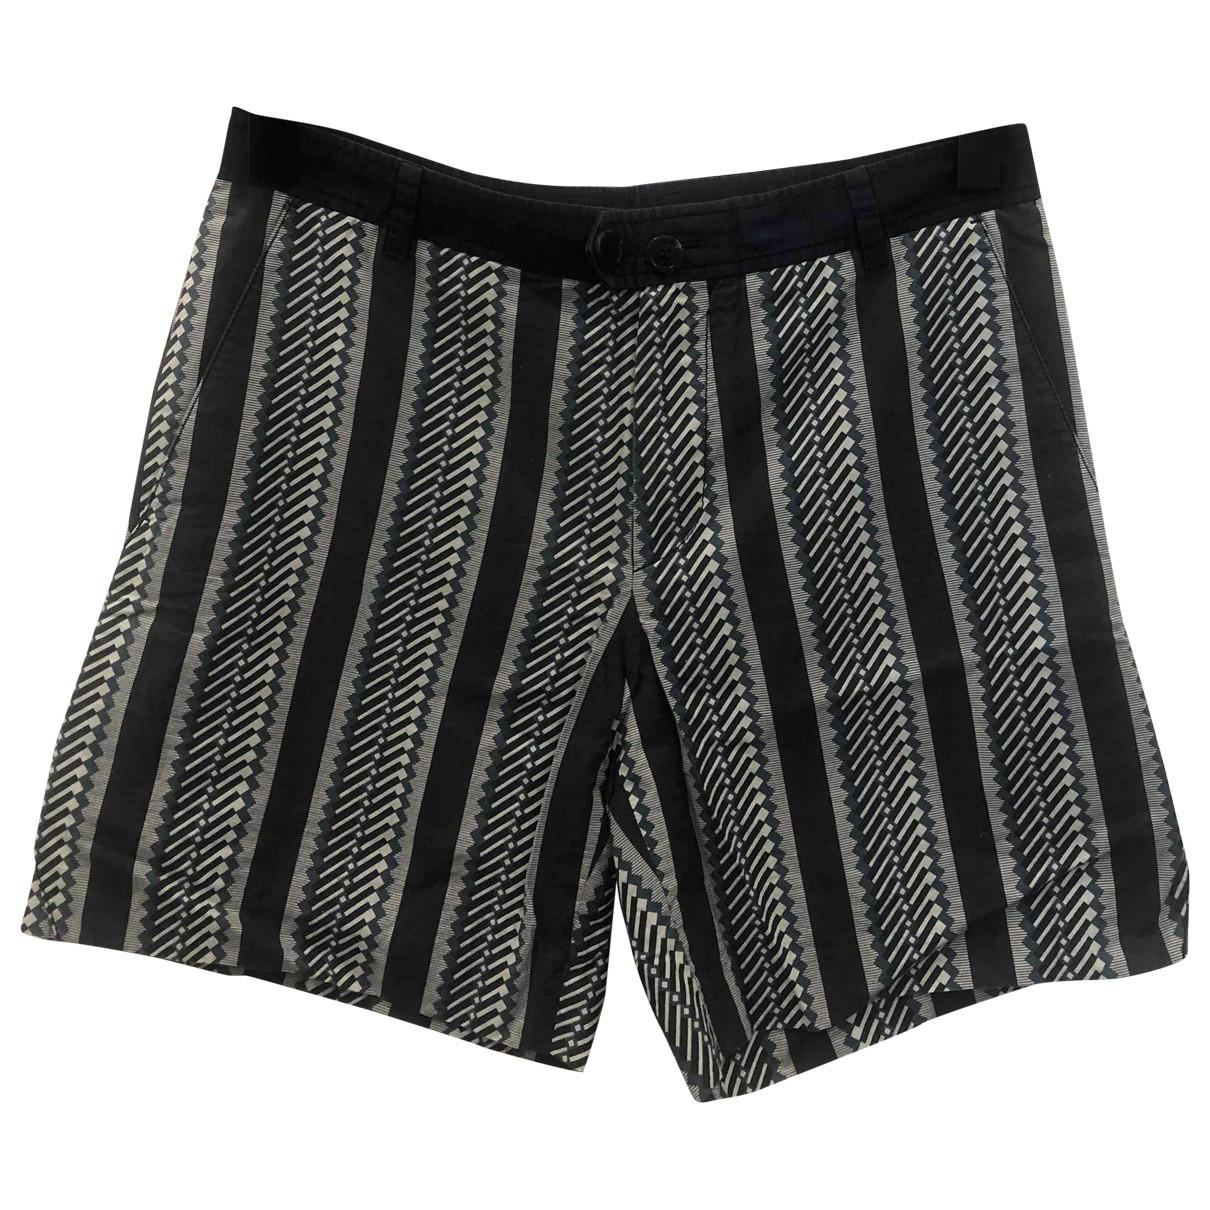 Wooyoungmi \N Multicolour Cotton Shorts for Men 46 IT